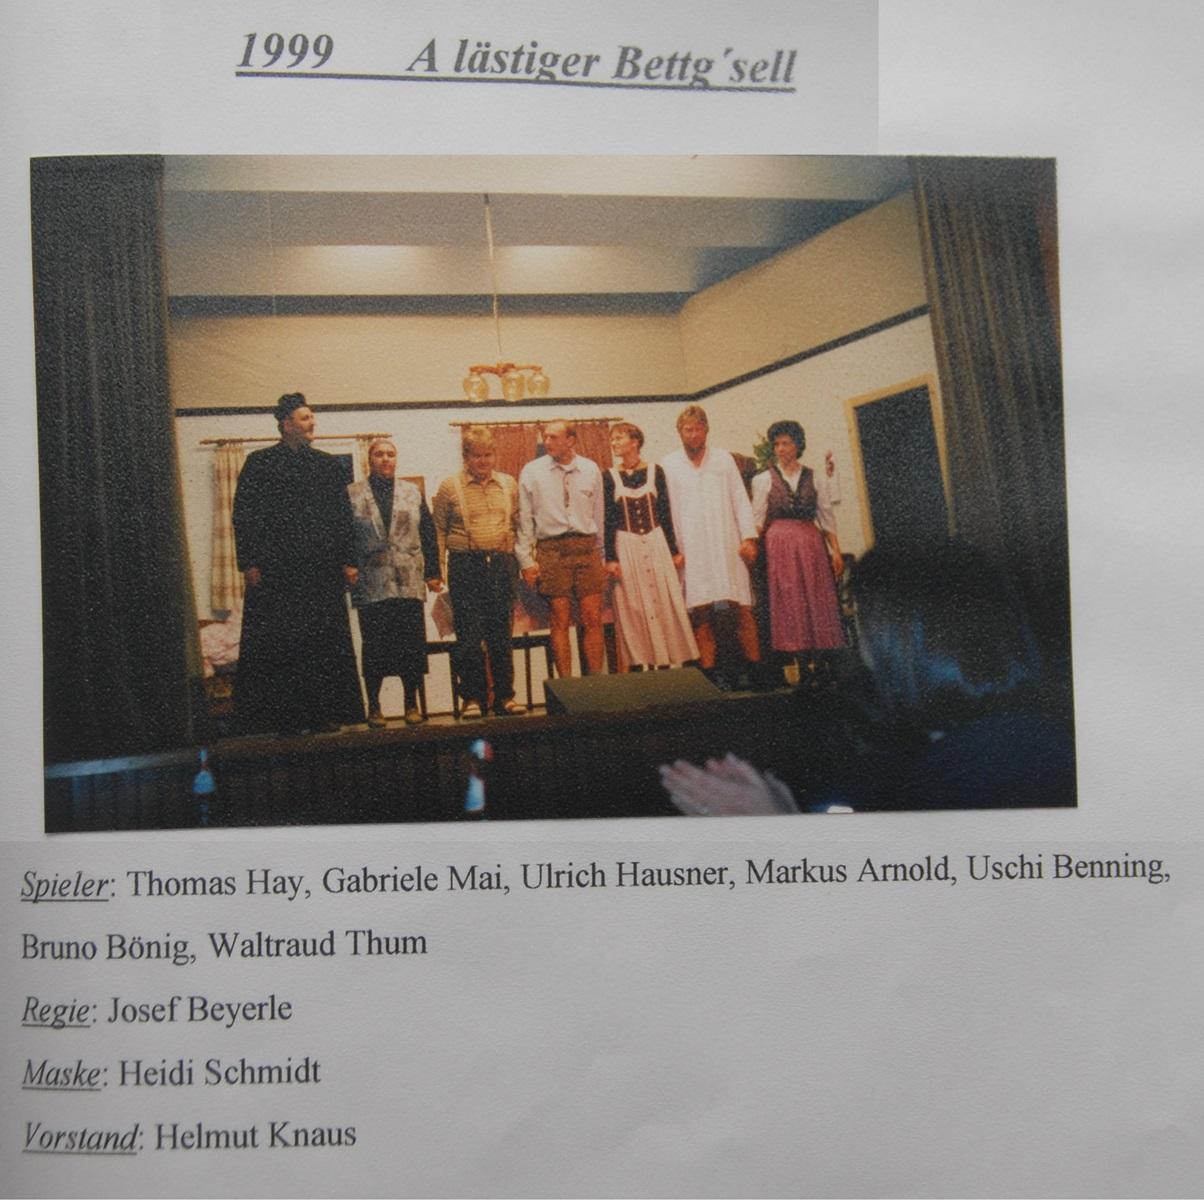 KSC-Theater-1999-A-laestiger-Bettgsell